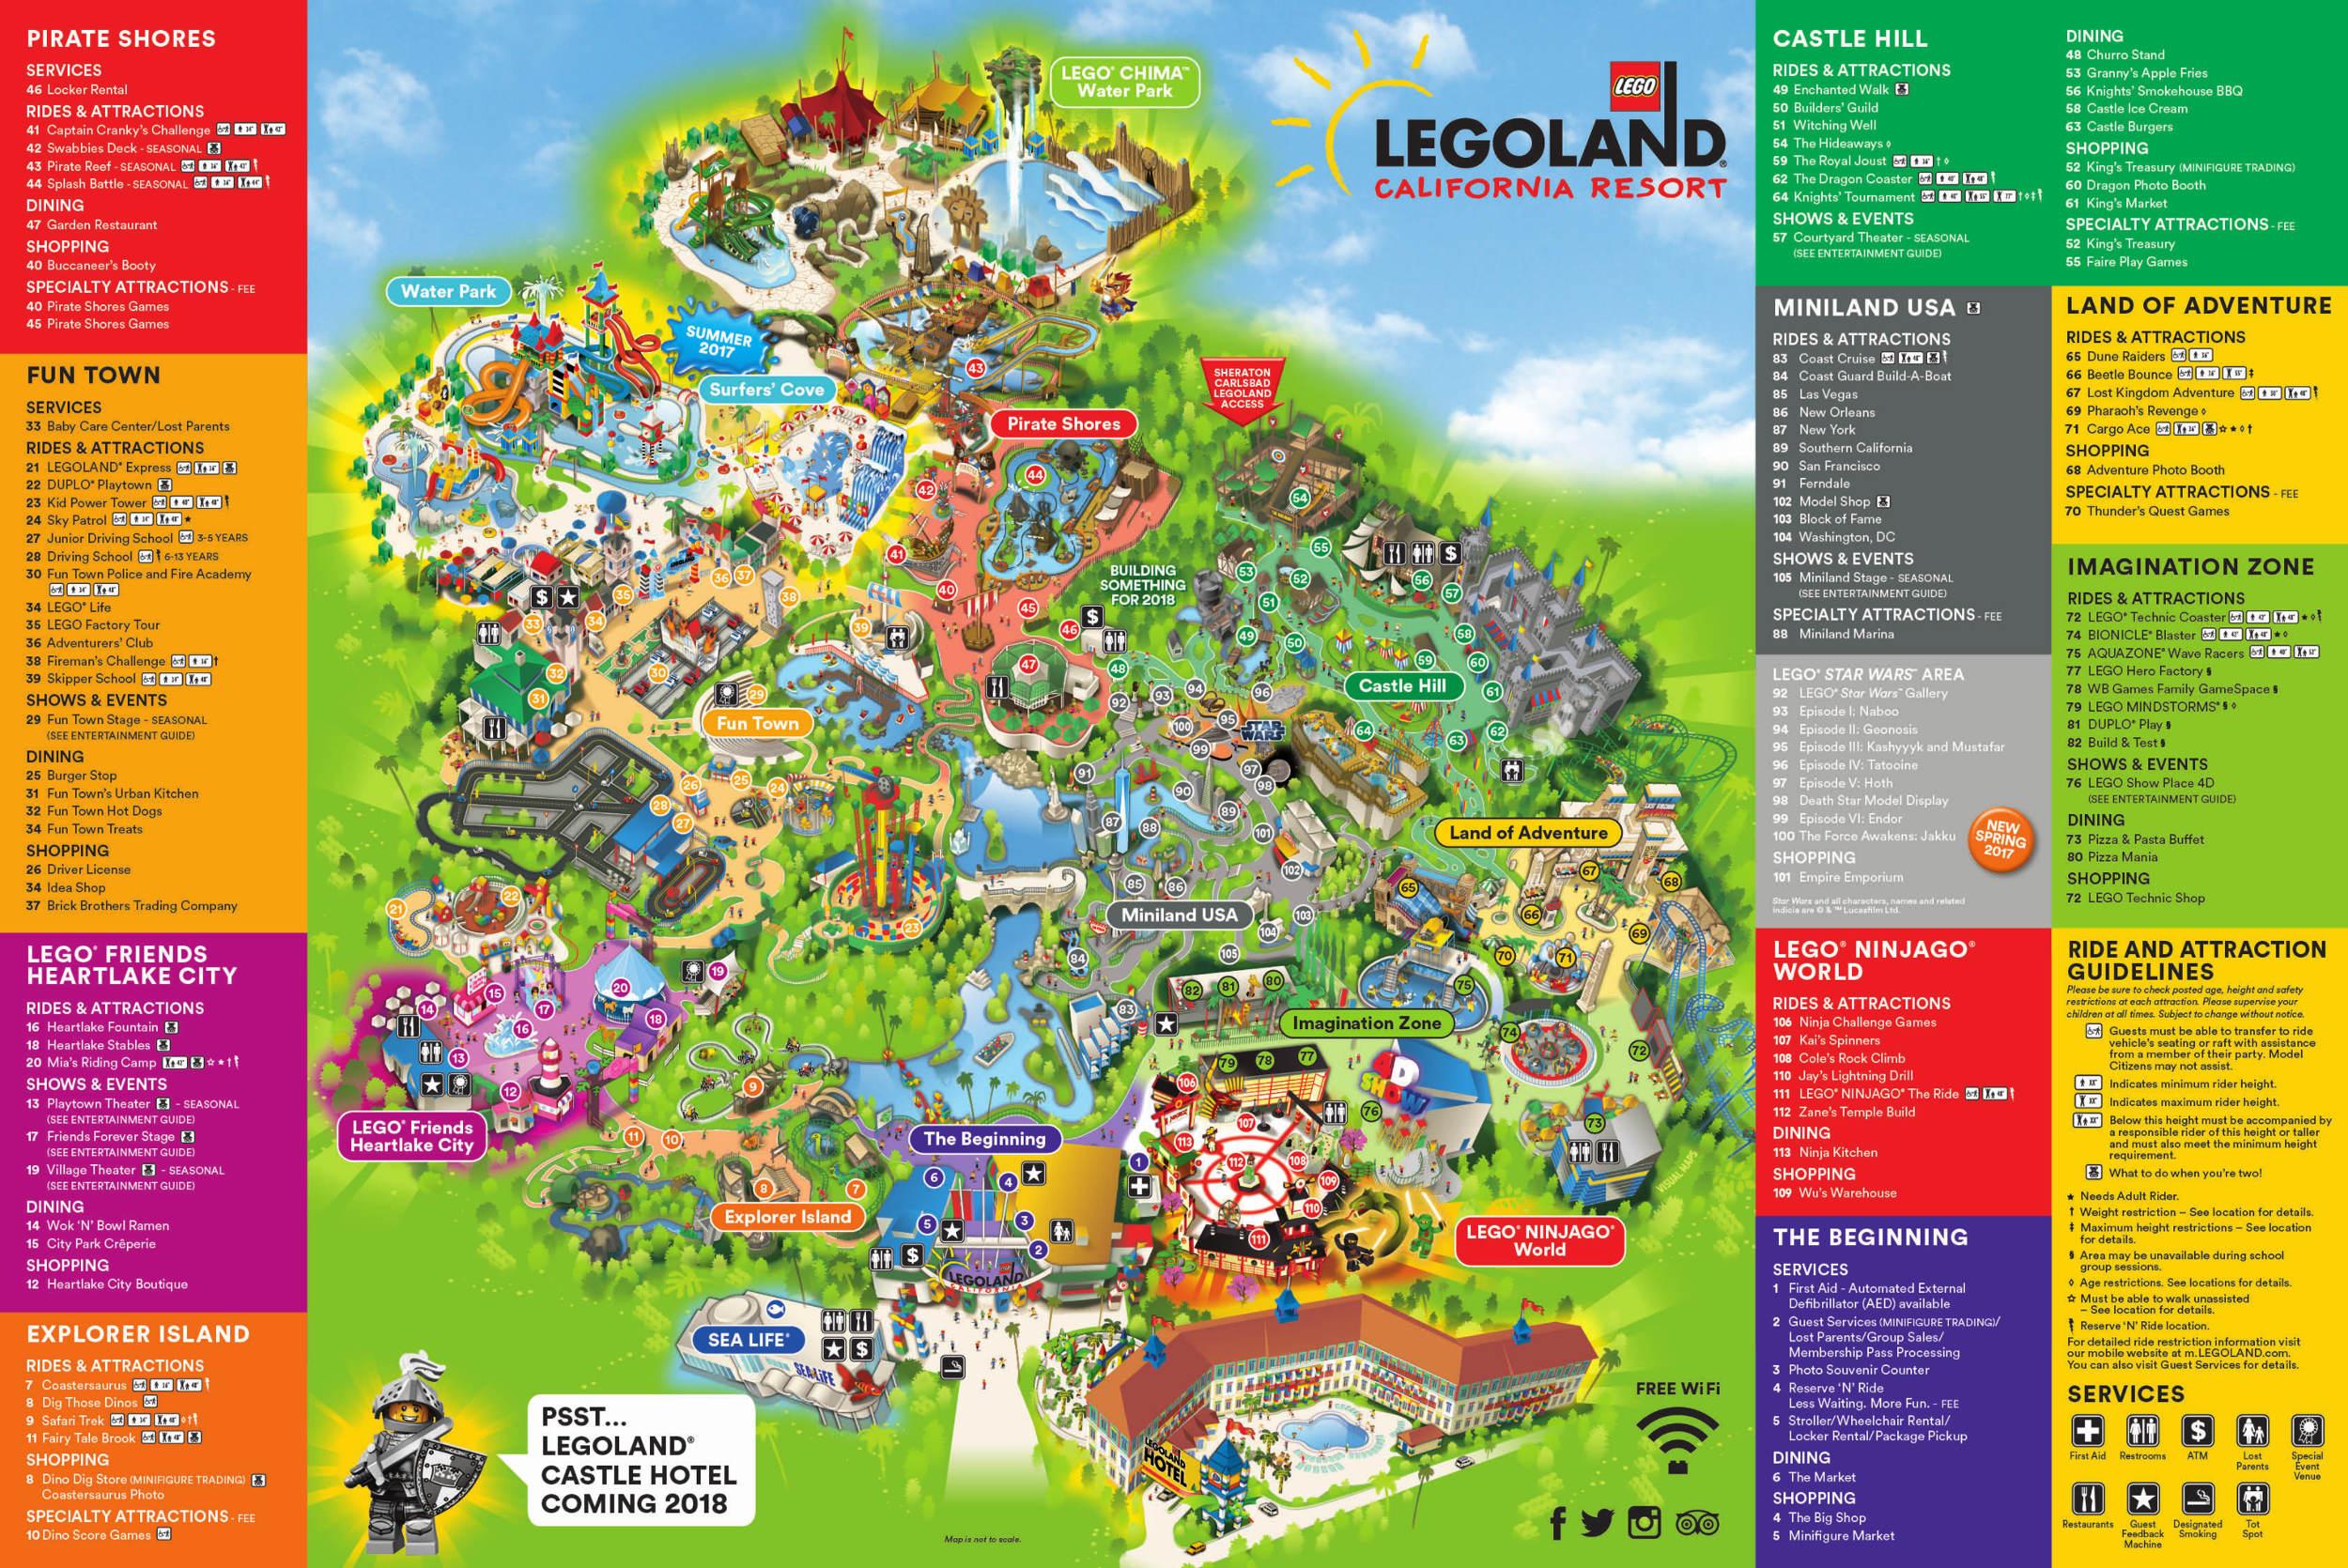 Theme Park Brochures Six Flags Great America In California S Map - Six Flags Map California 2018